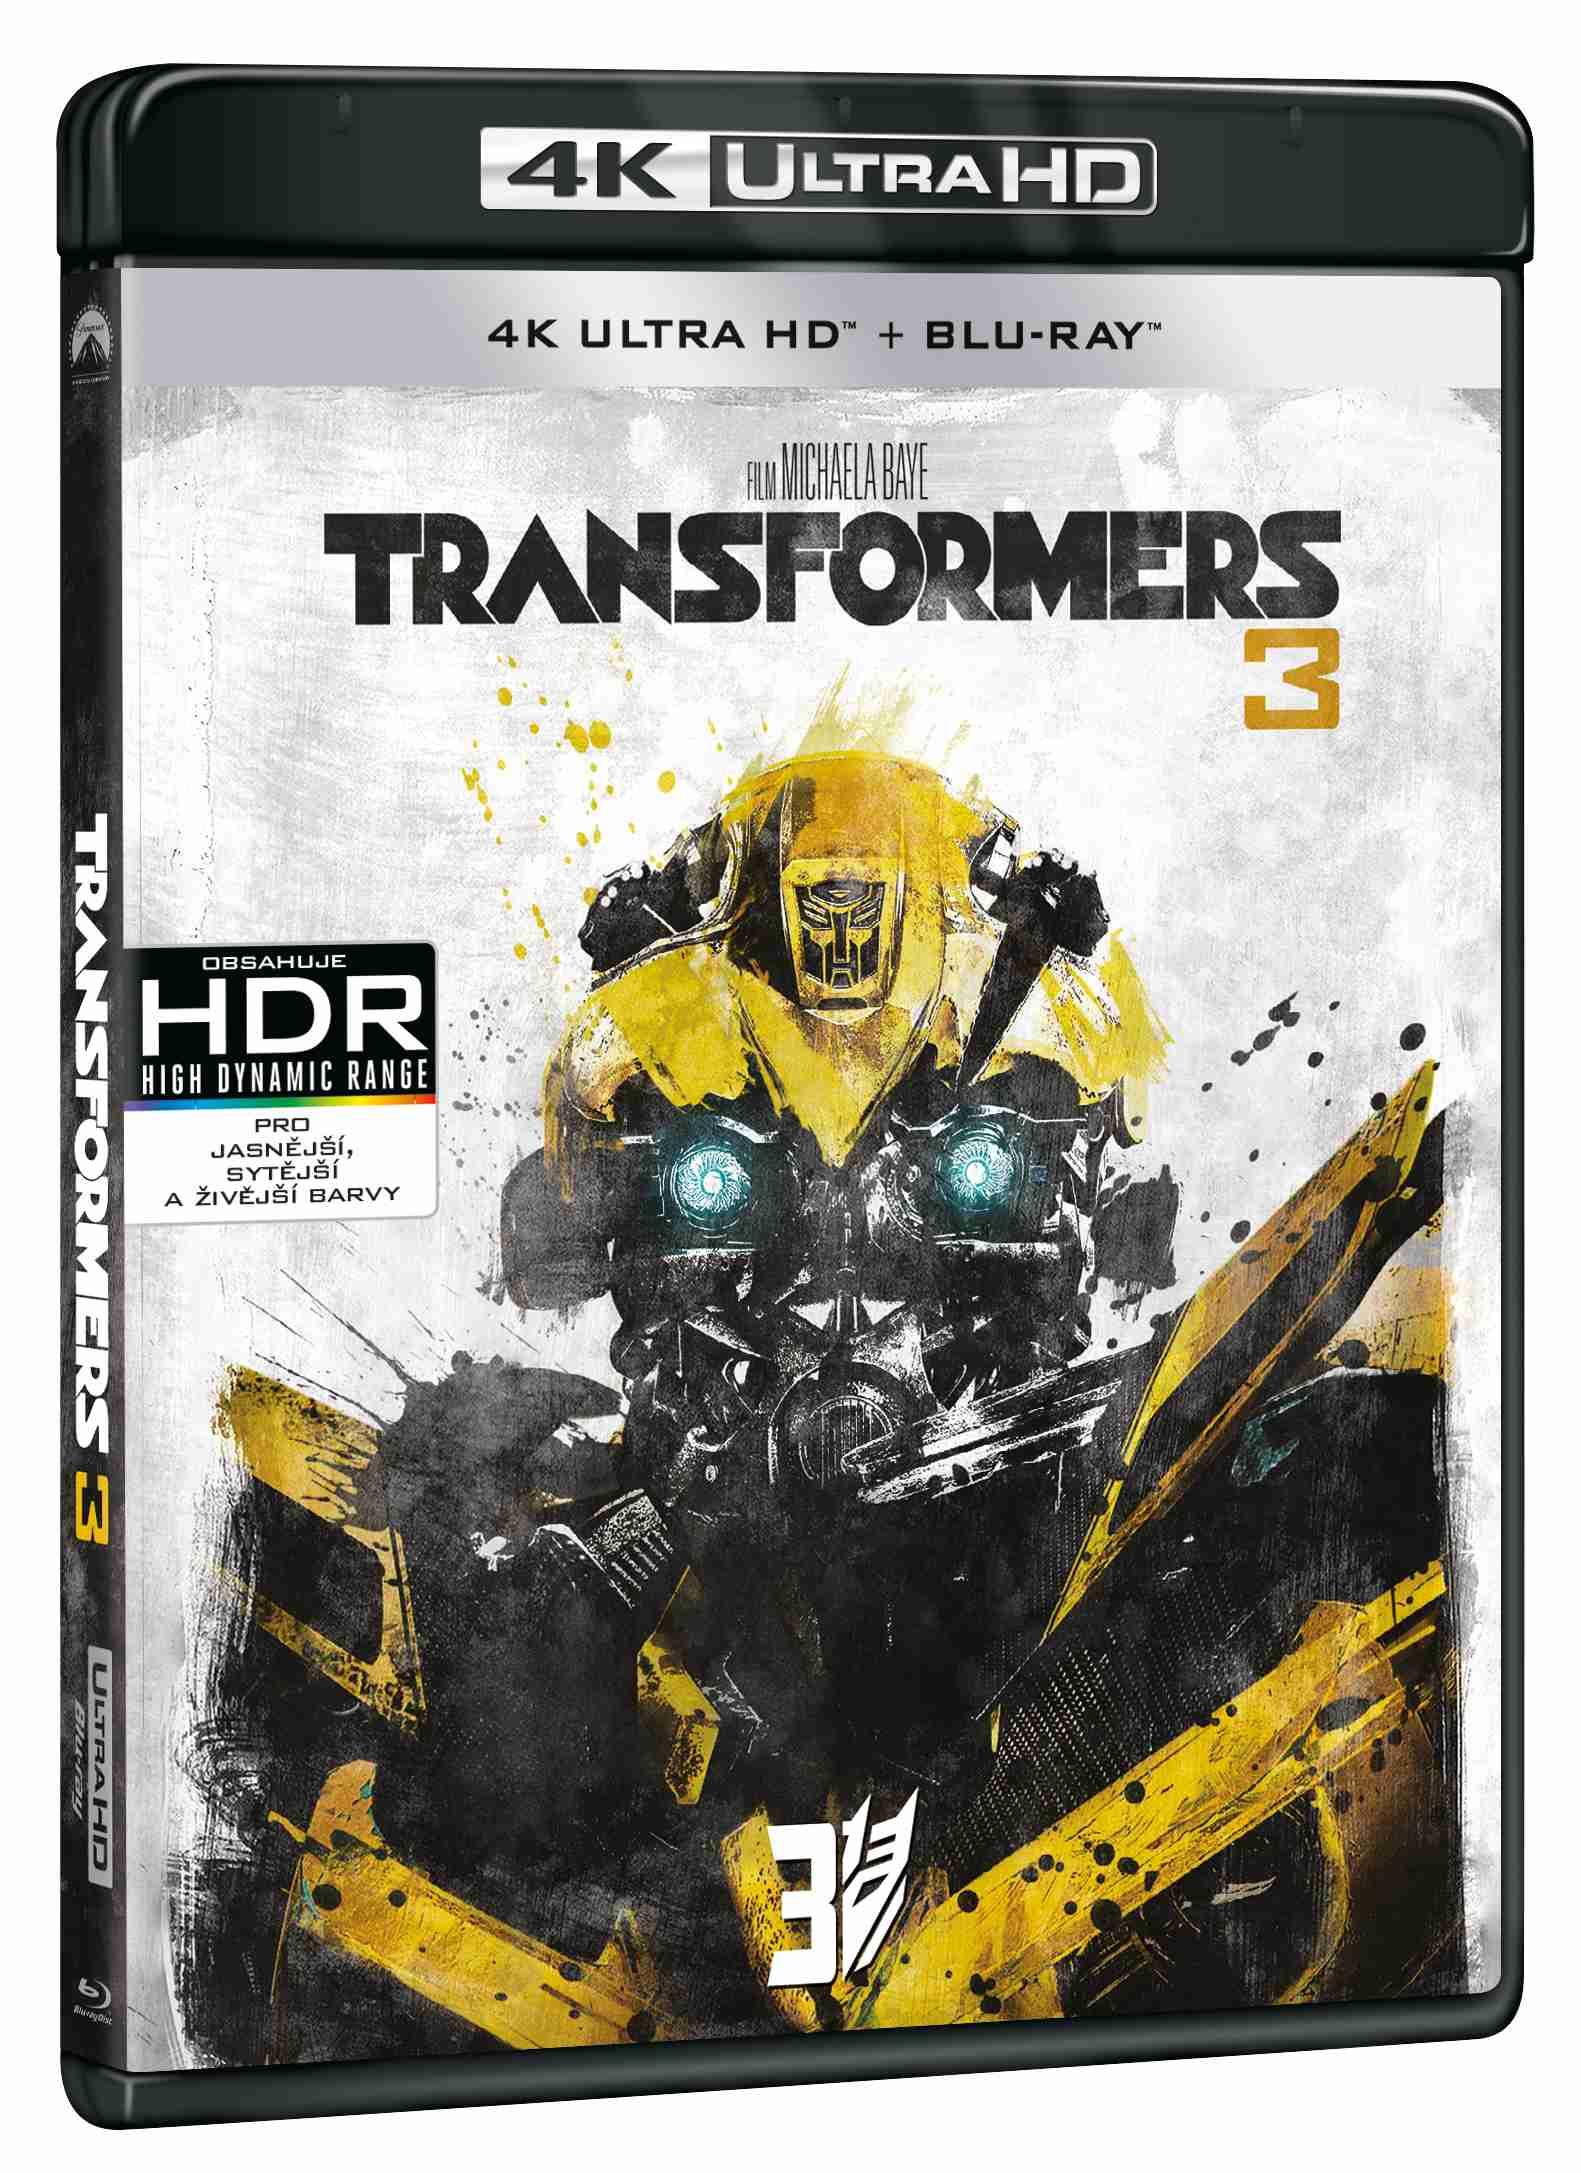 TRANSFORMERS 3 (4K ULTRA HD) - UHD Blu-ray + Blu-ray (2 BD)